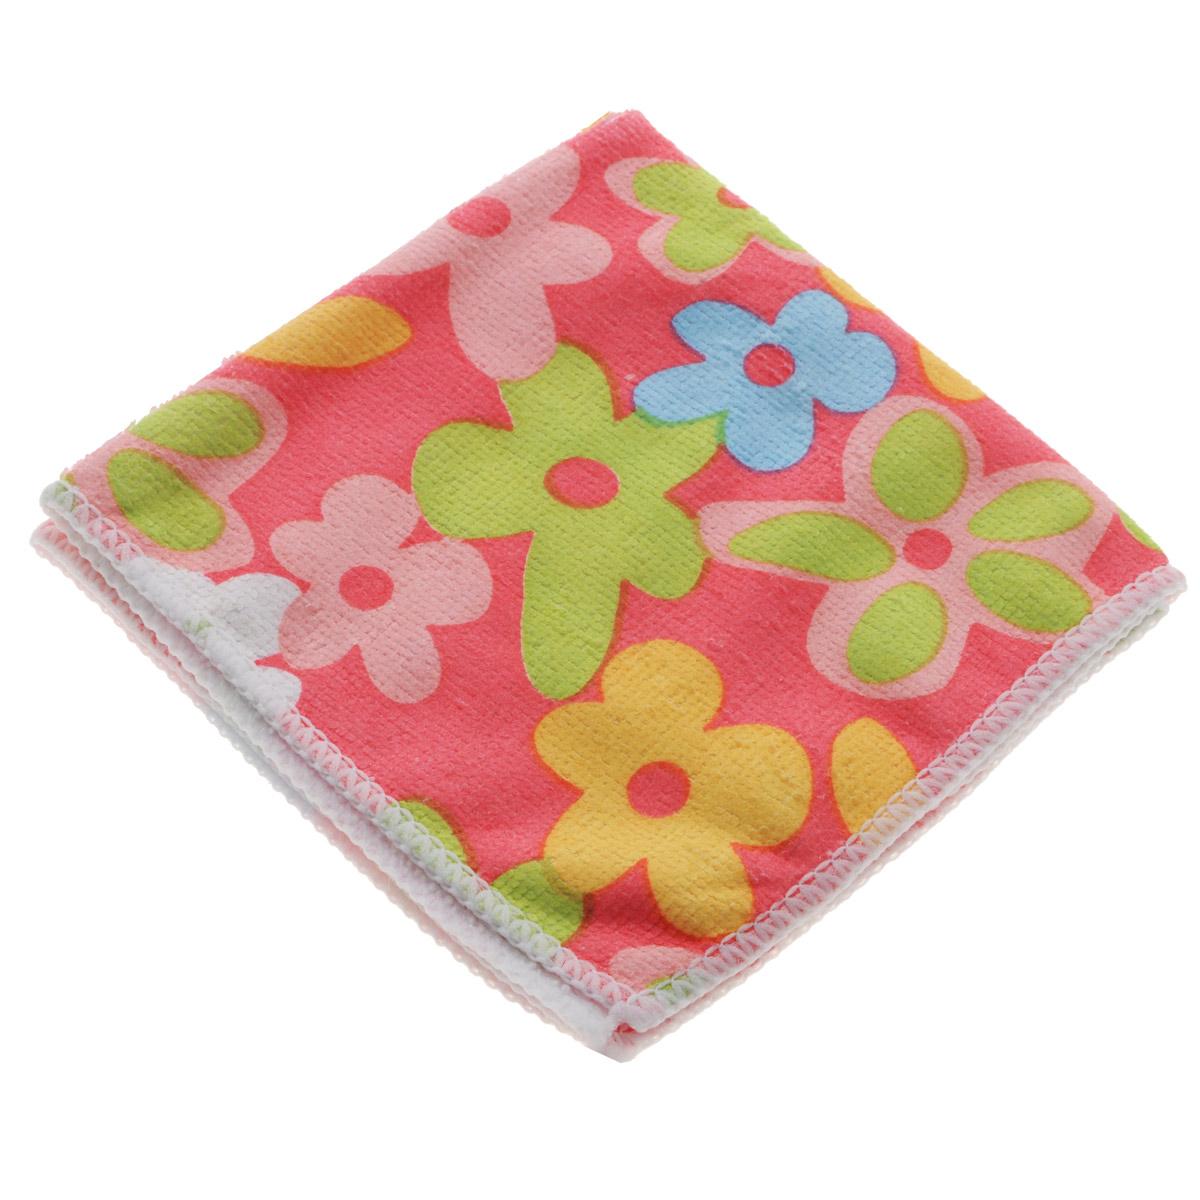 Салфетка для уборки You'll Love Цветы, цвет: розовый, 30 см х 30 см салфетка home queen цветы цвет синий диаметр 30 см